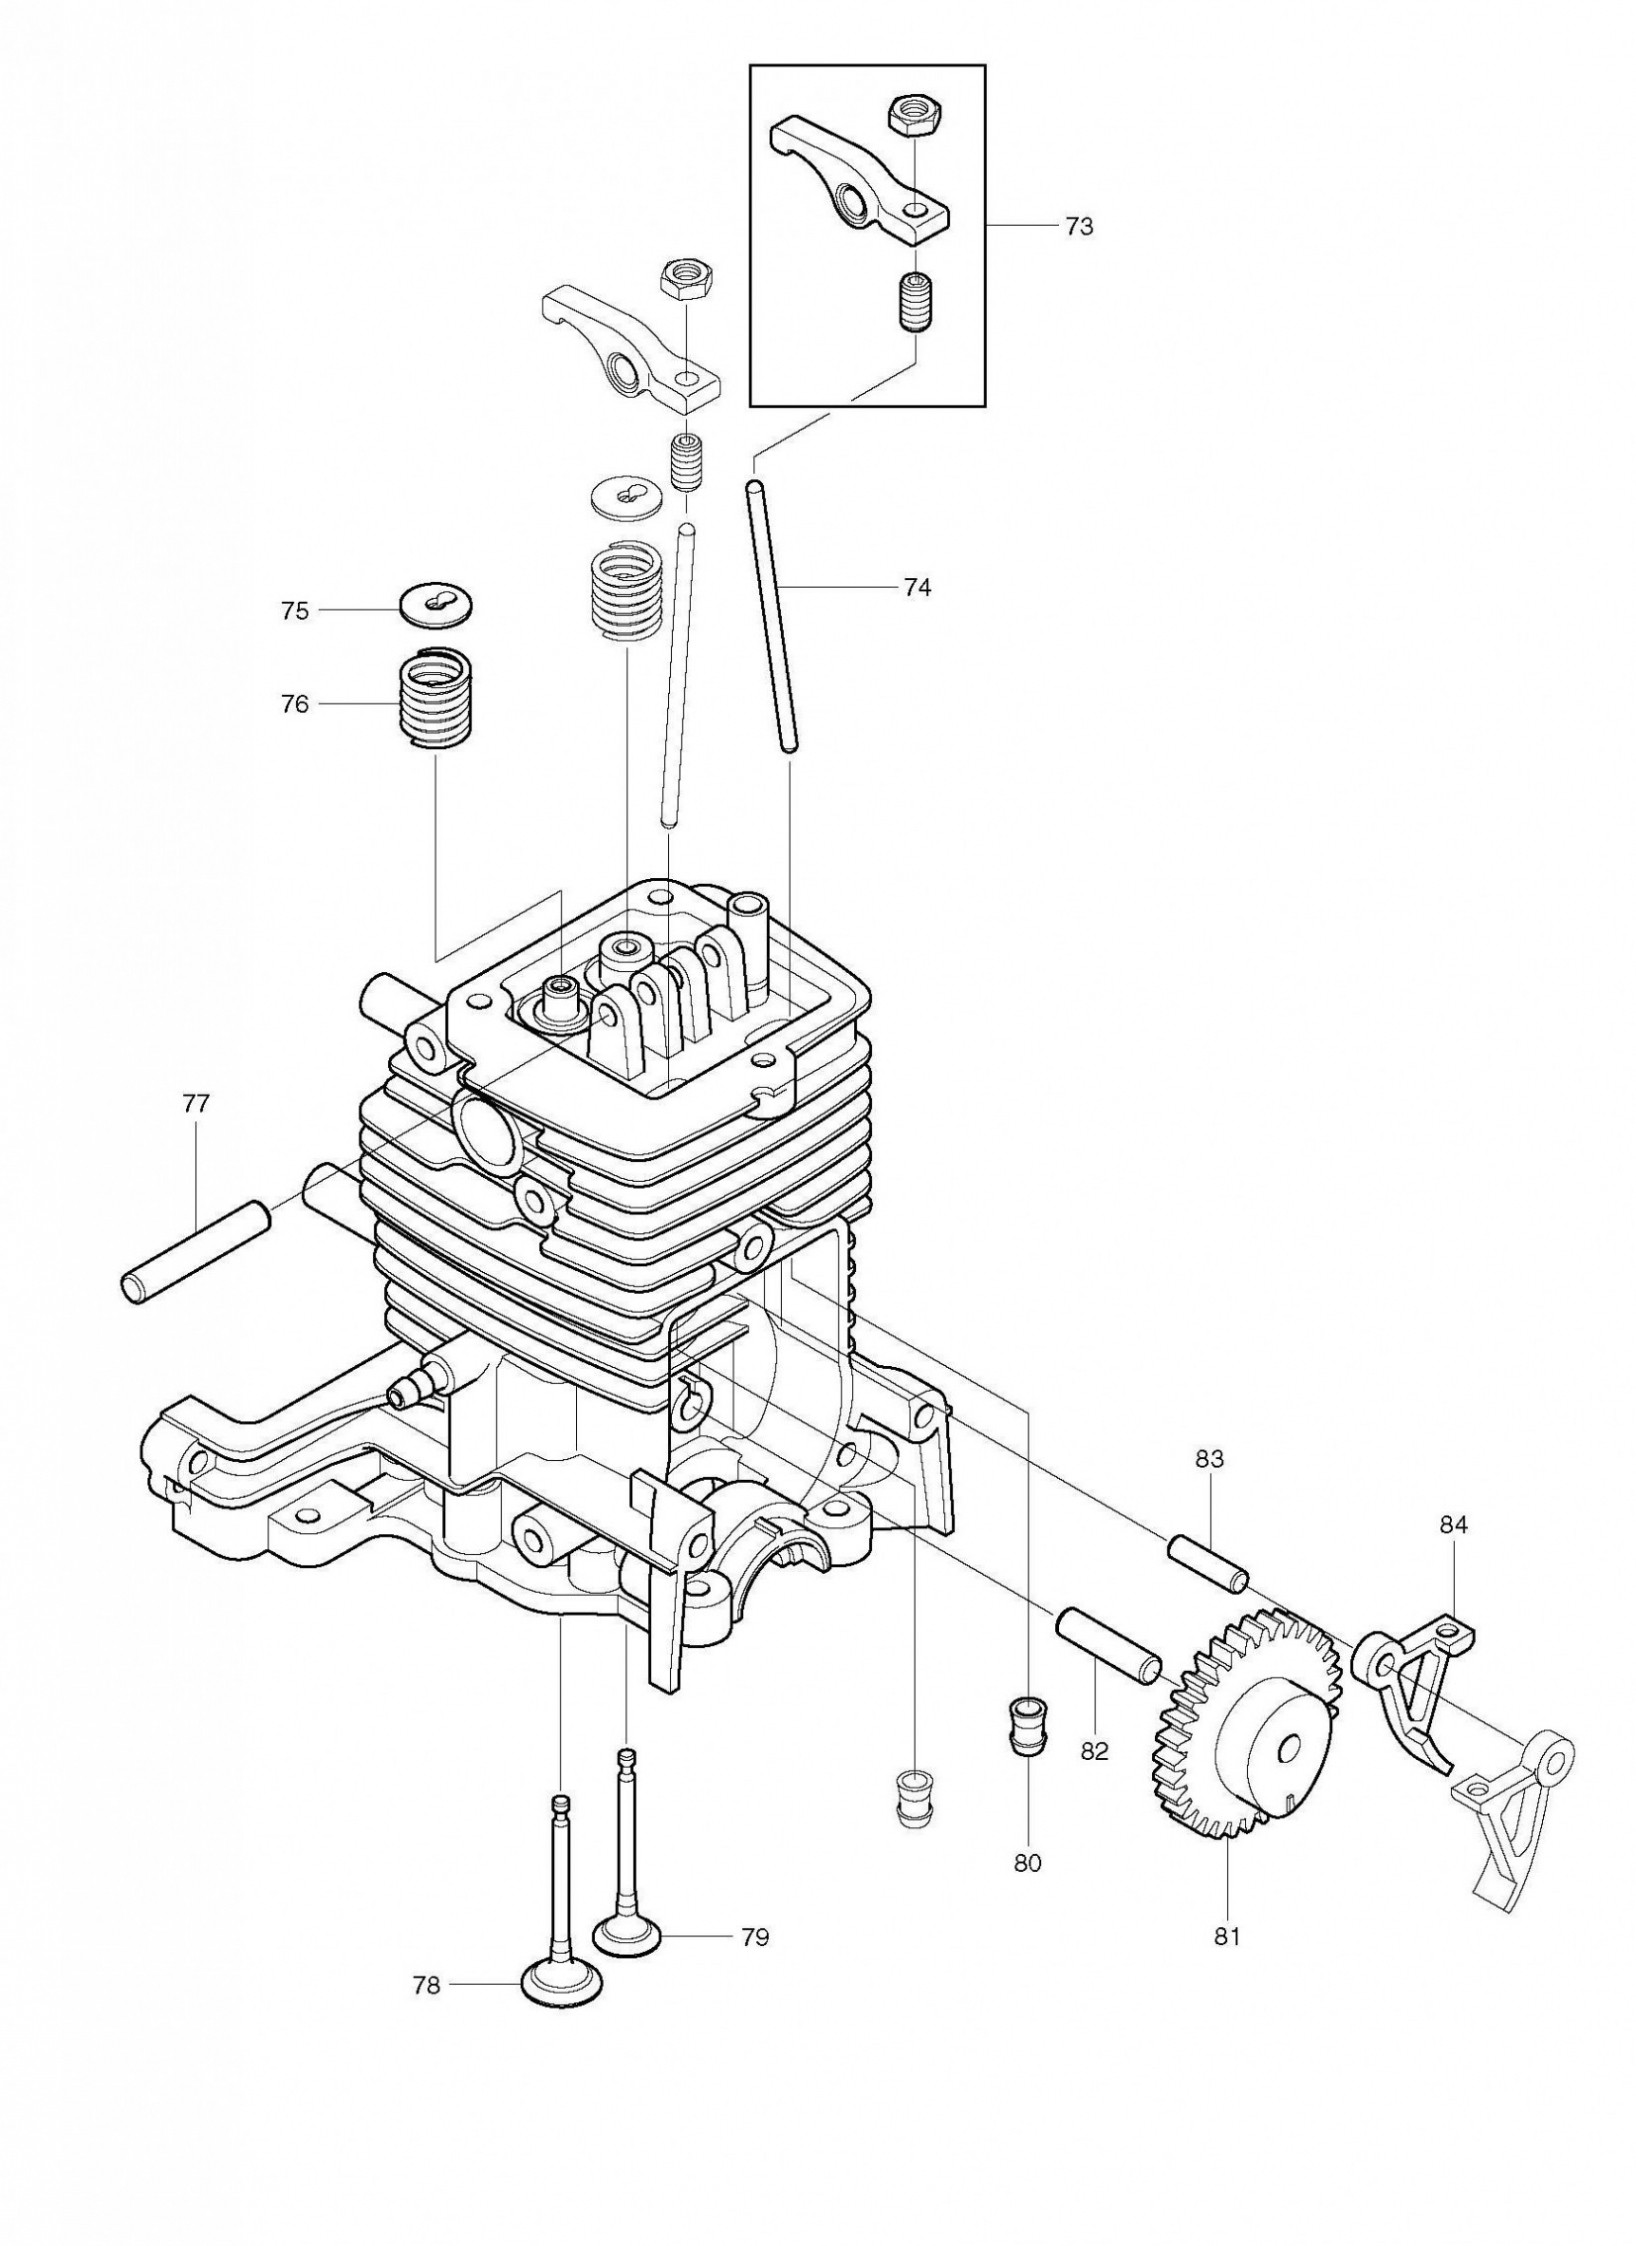 Diagram Of Four Stroke Engine 4 Stroke Engine Diagram – Four Stroke Engine Diagram Daytonva150 Of Diagram Of Four Stroke Engine